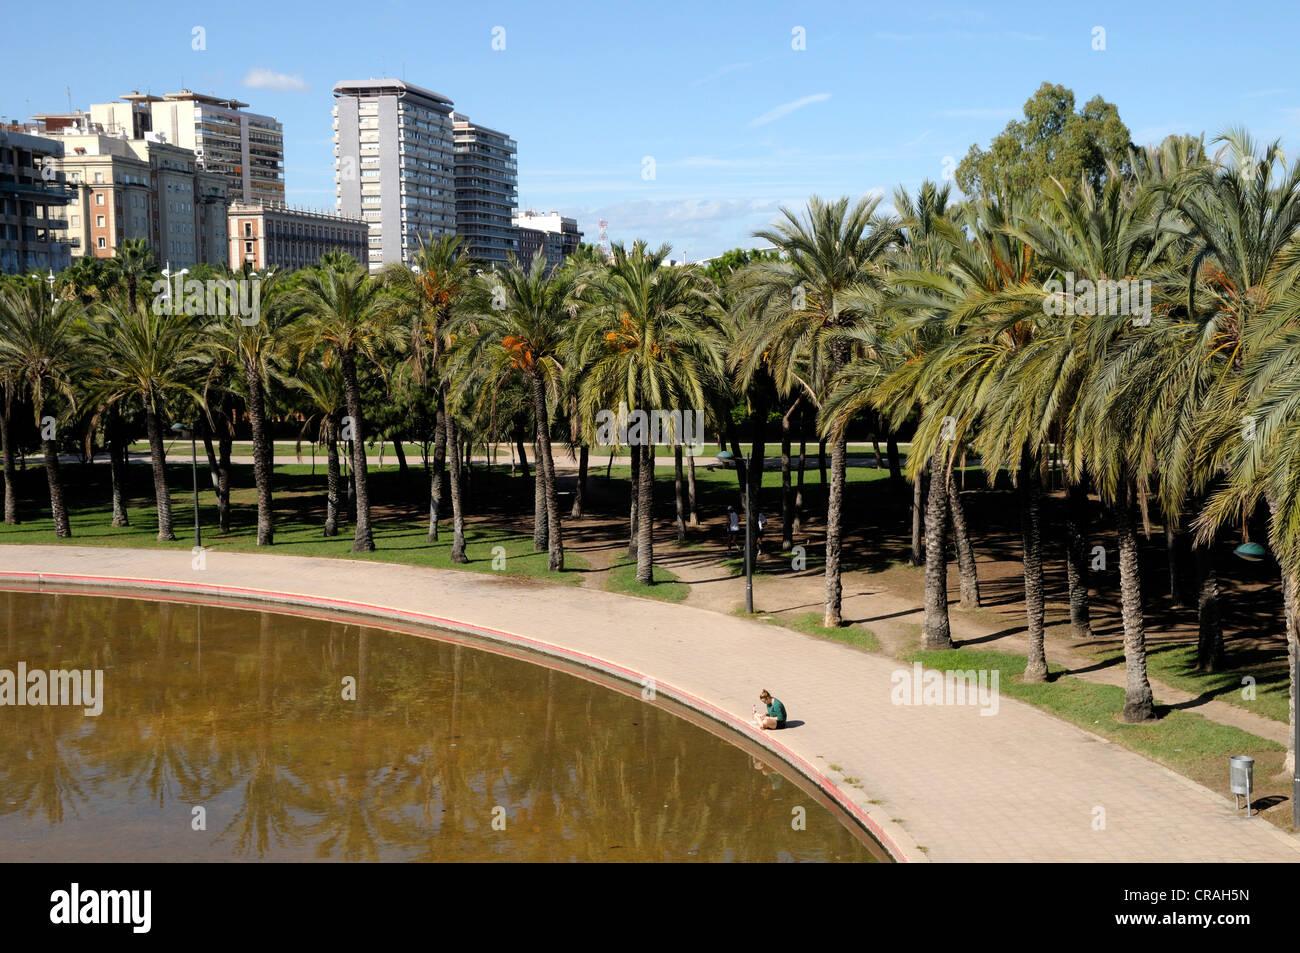 Turia park stock photos turia park stock images alamy for Jardines de tabarca valencia